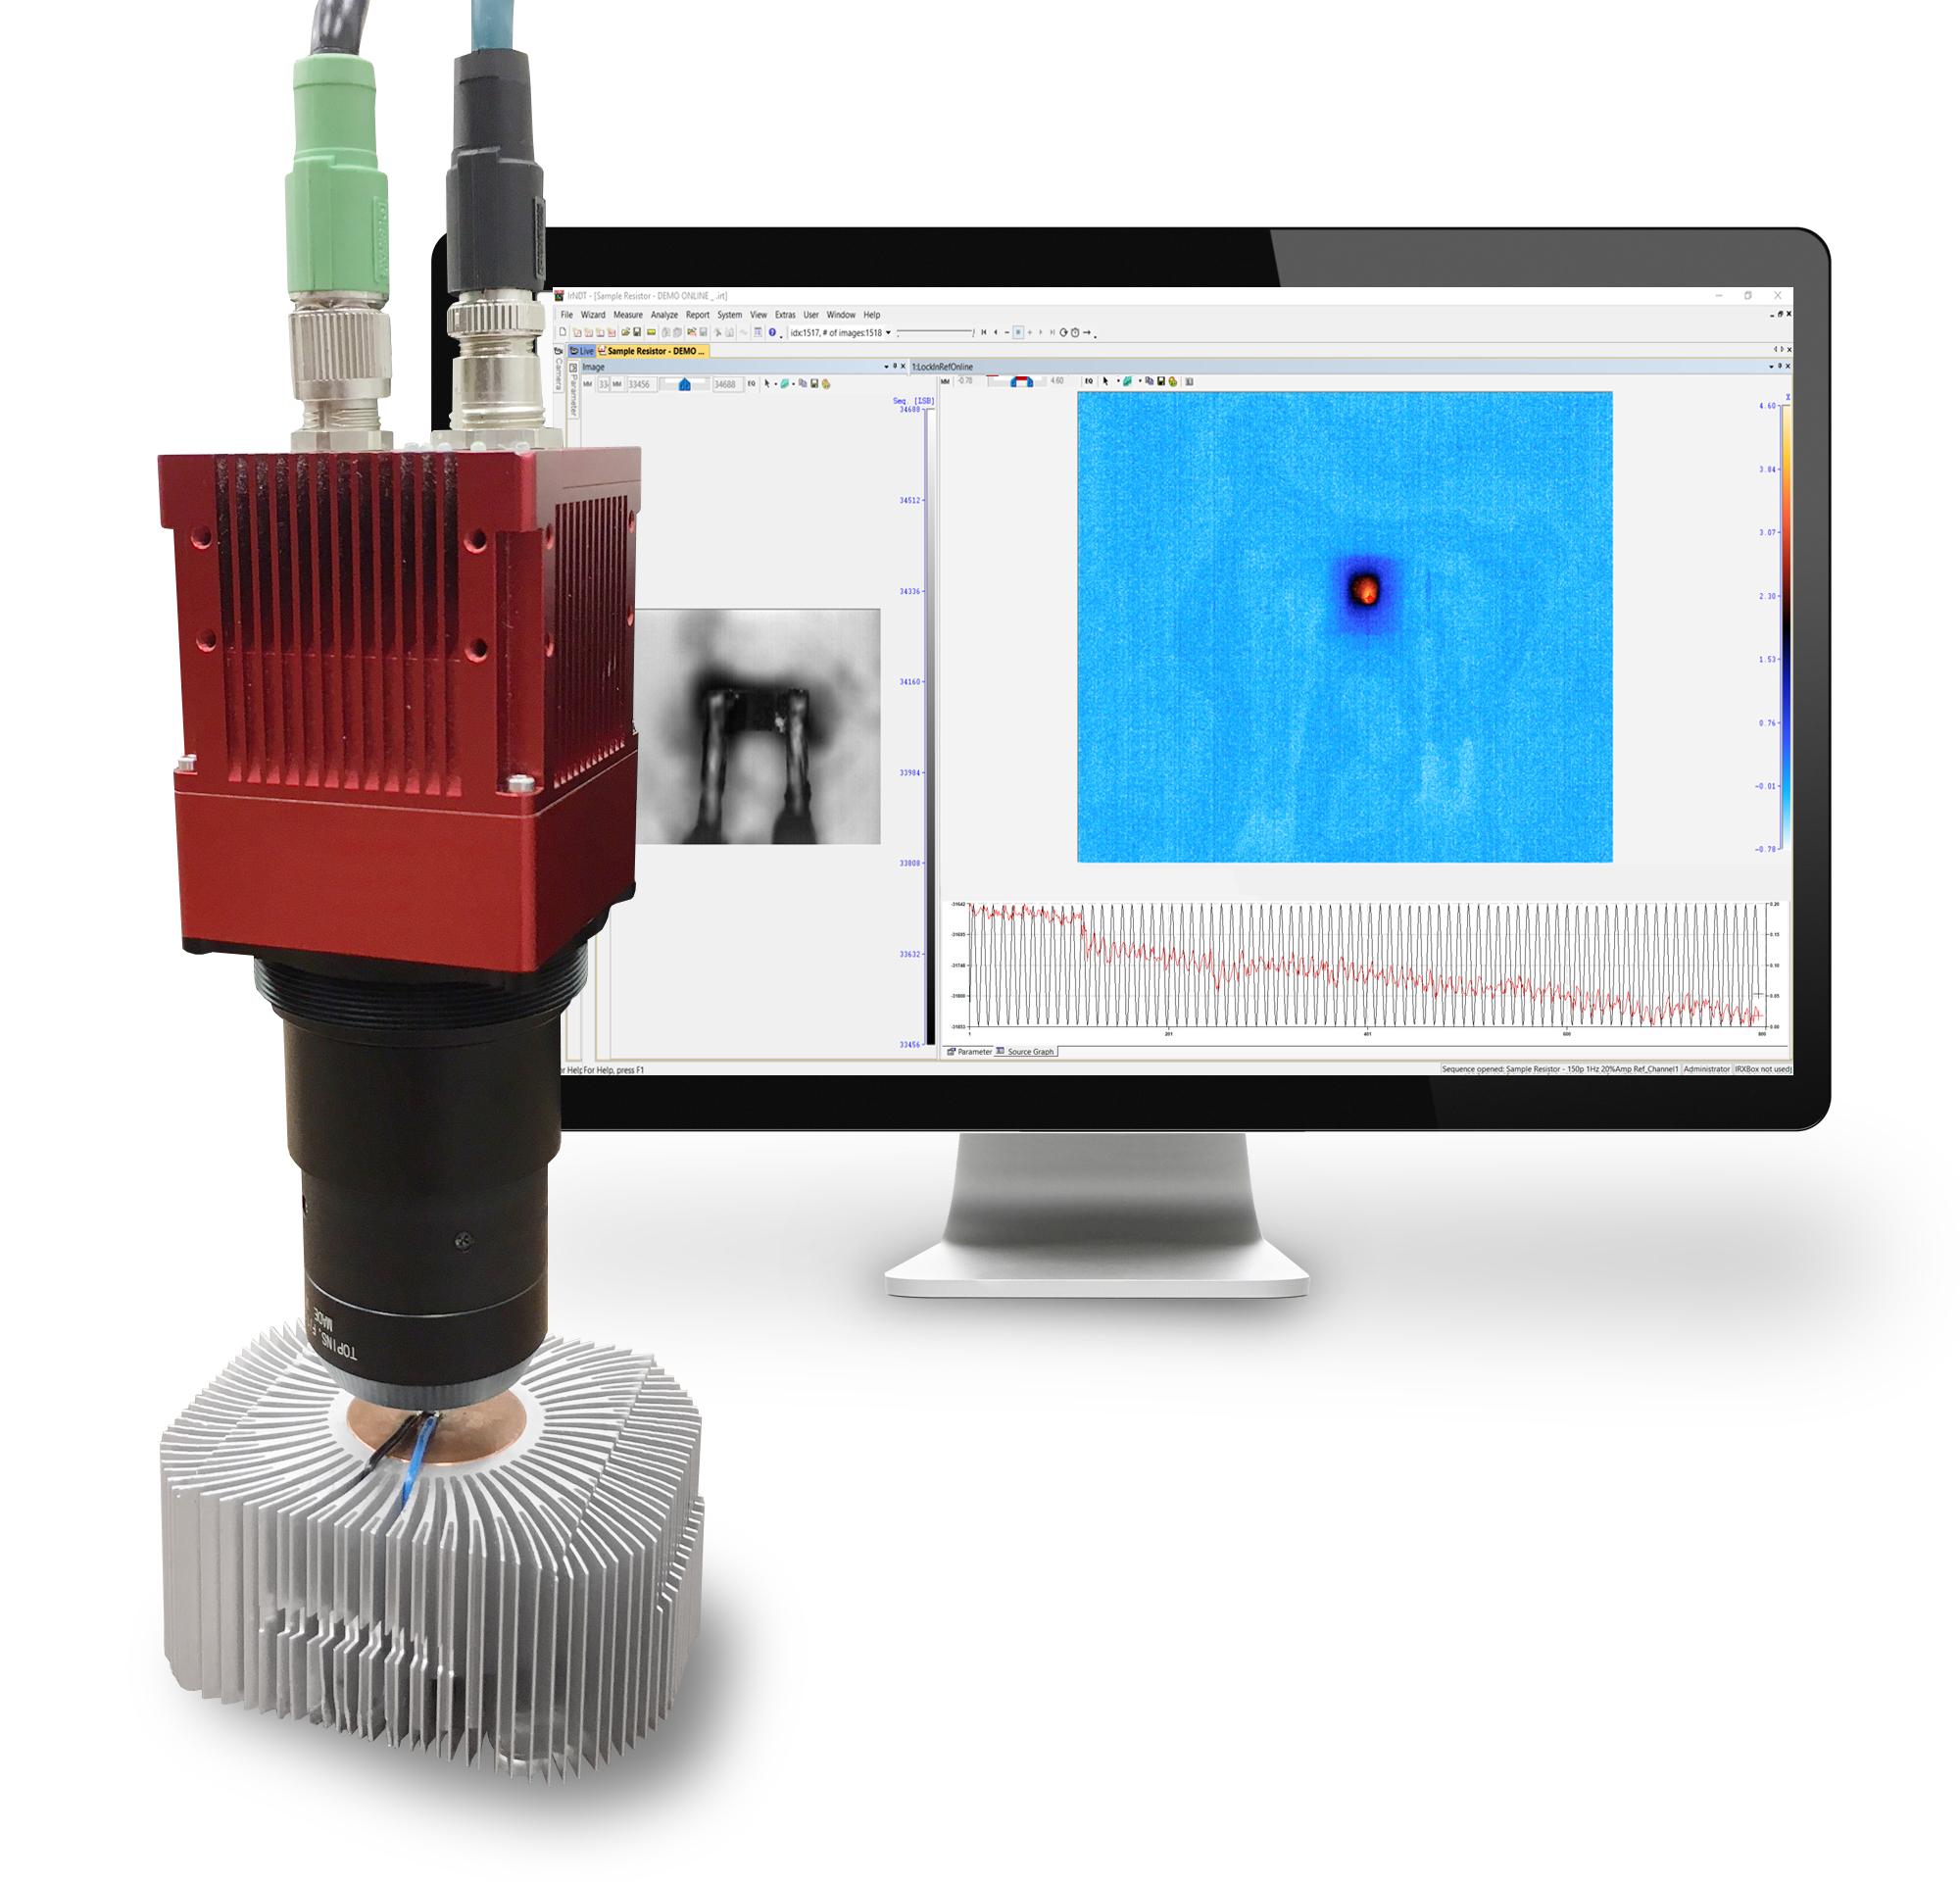 Wärmekamera mit Mikroskopoptik